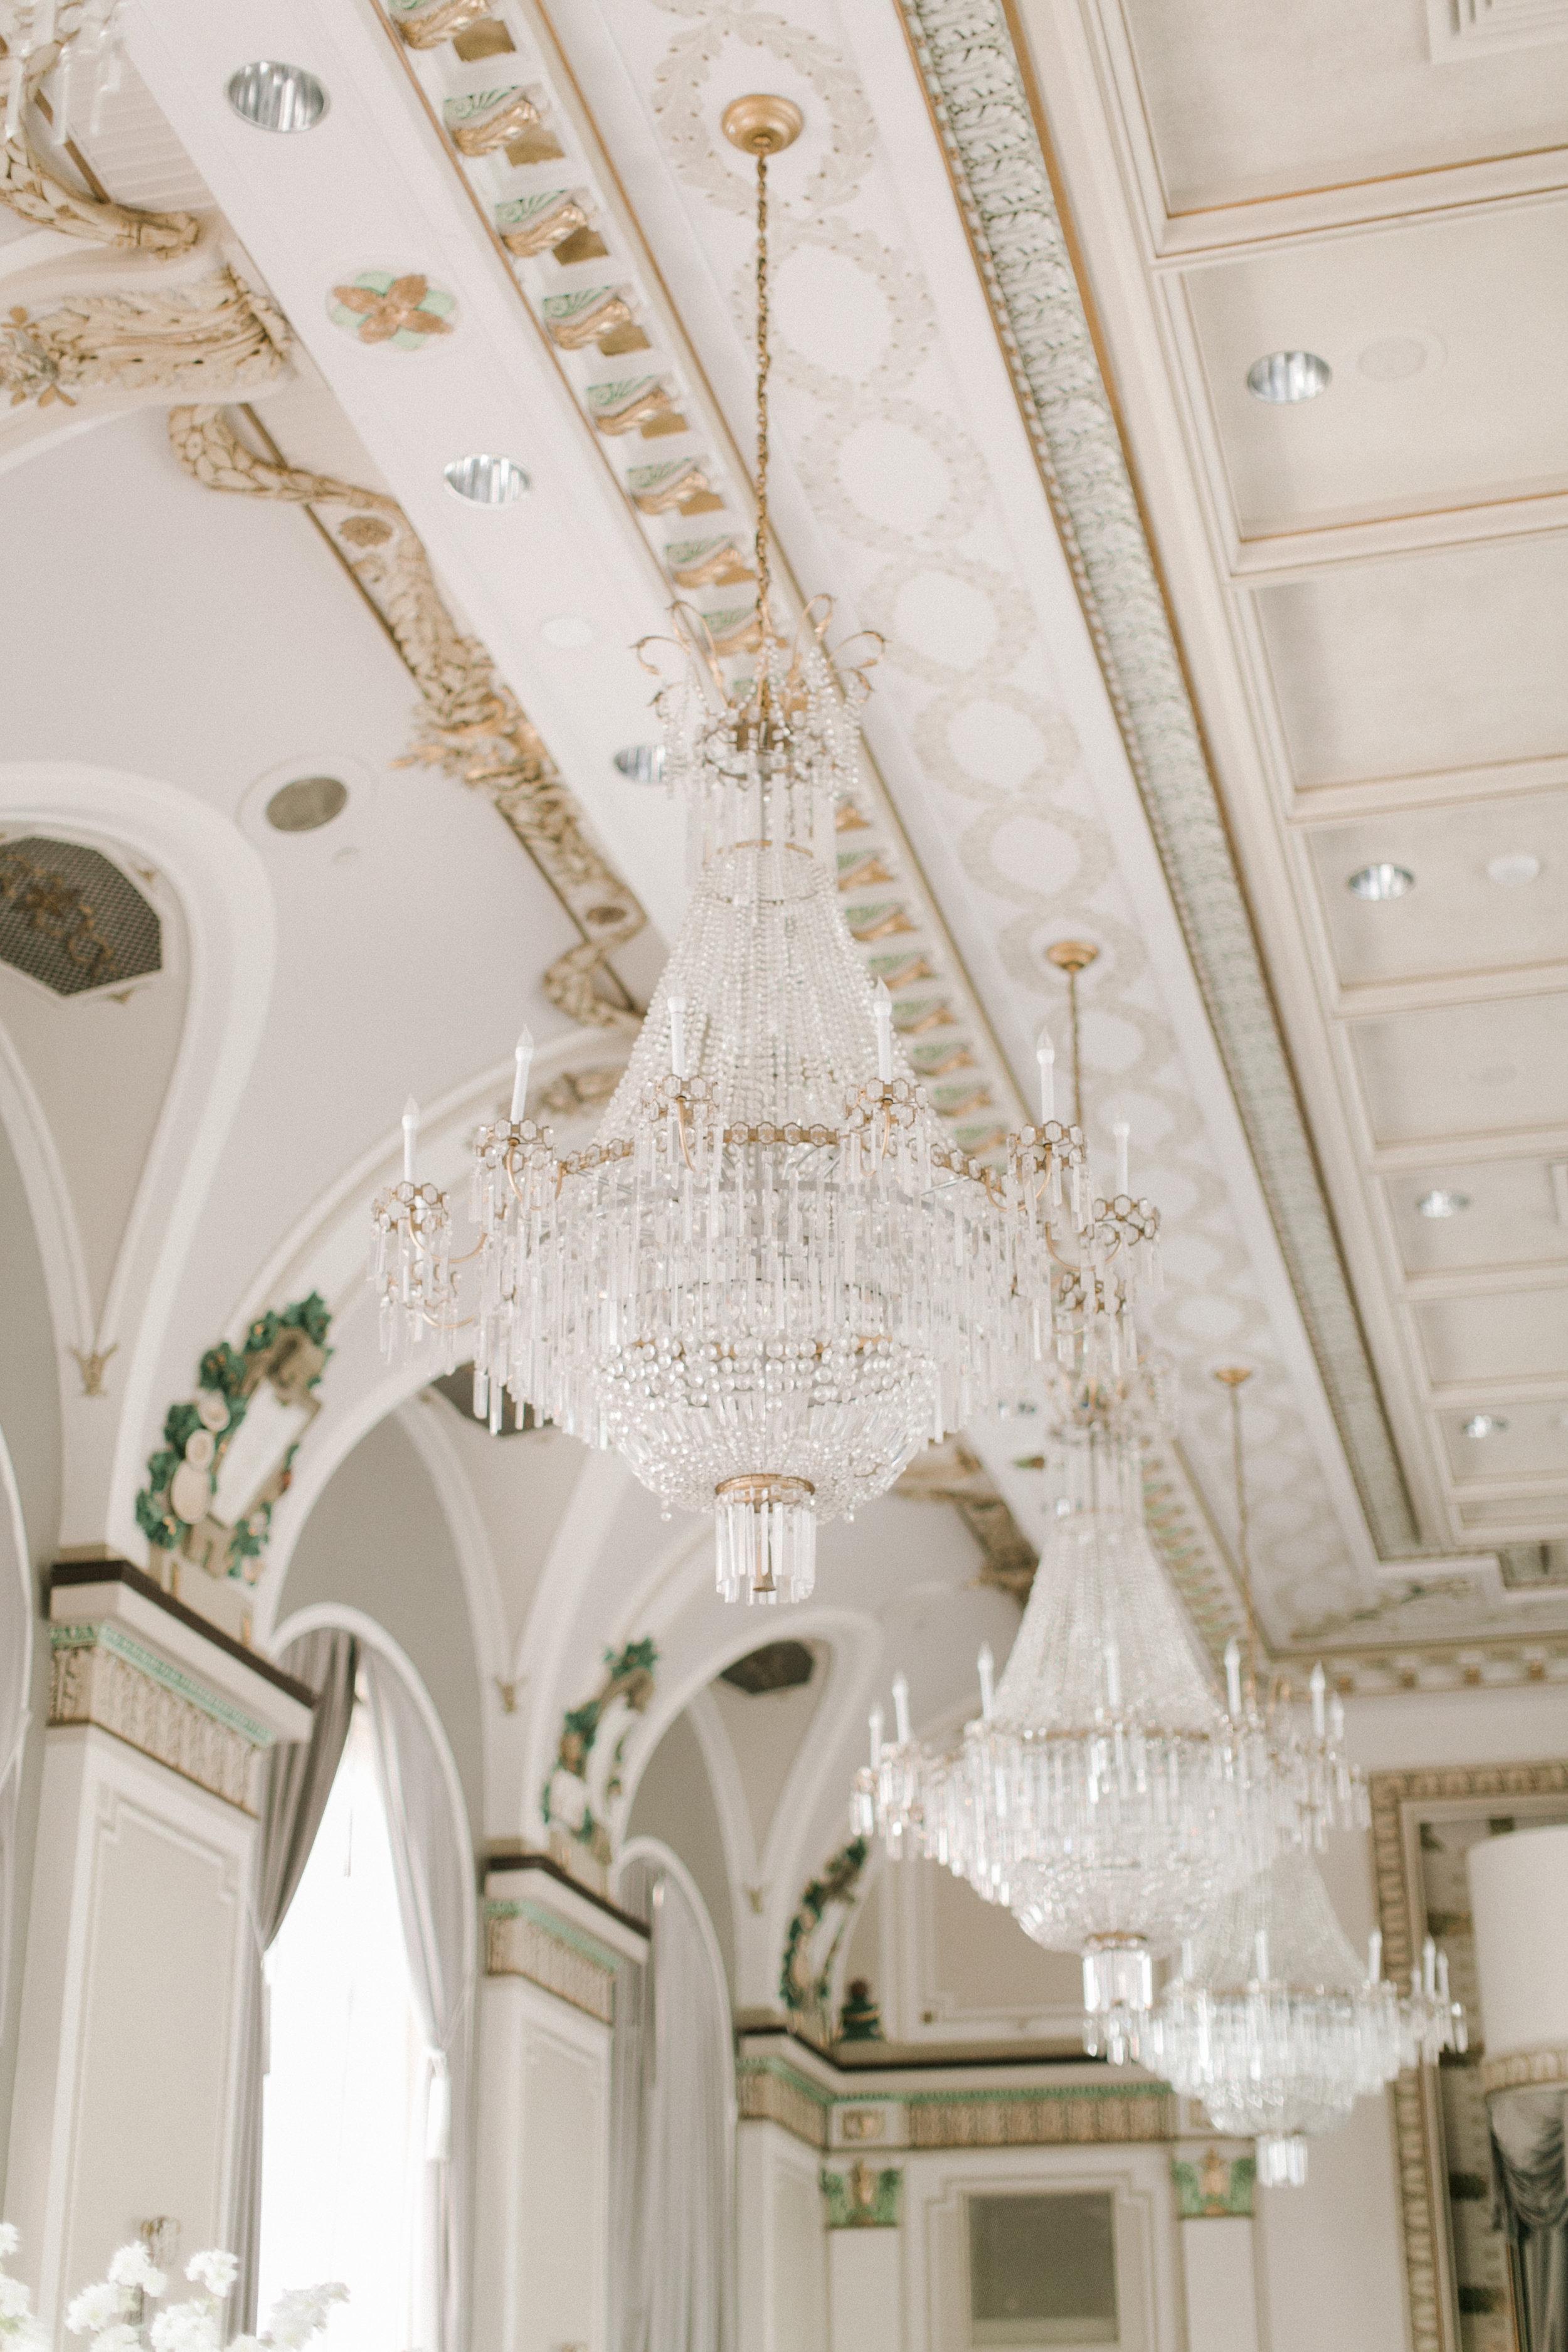 chateau-frontenac-quebec-city-best-toronto-wedding-photographer-soft-bright-pastel-richelle-hunter-elliott-heidi-683.jpg